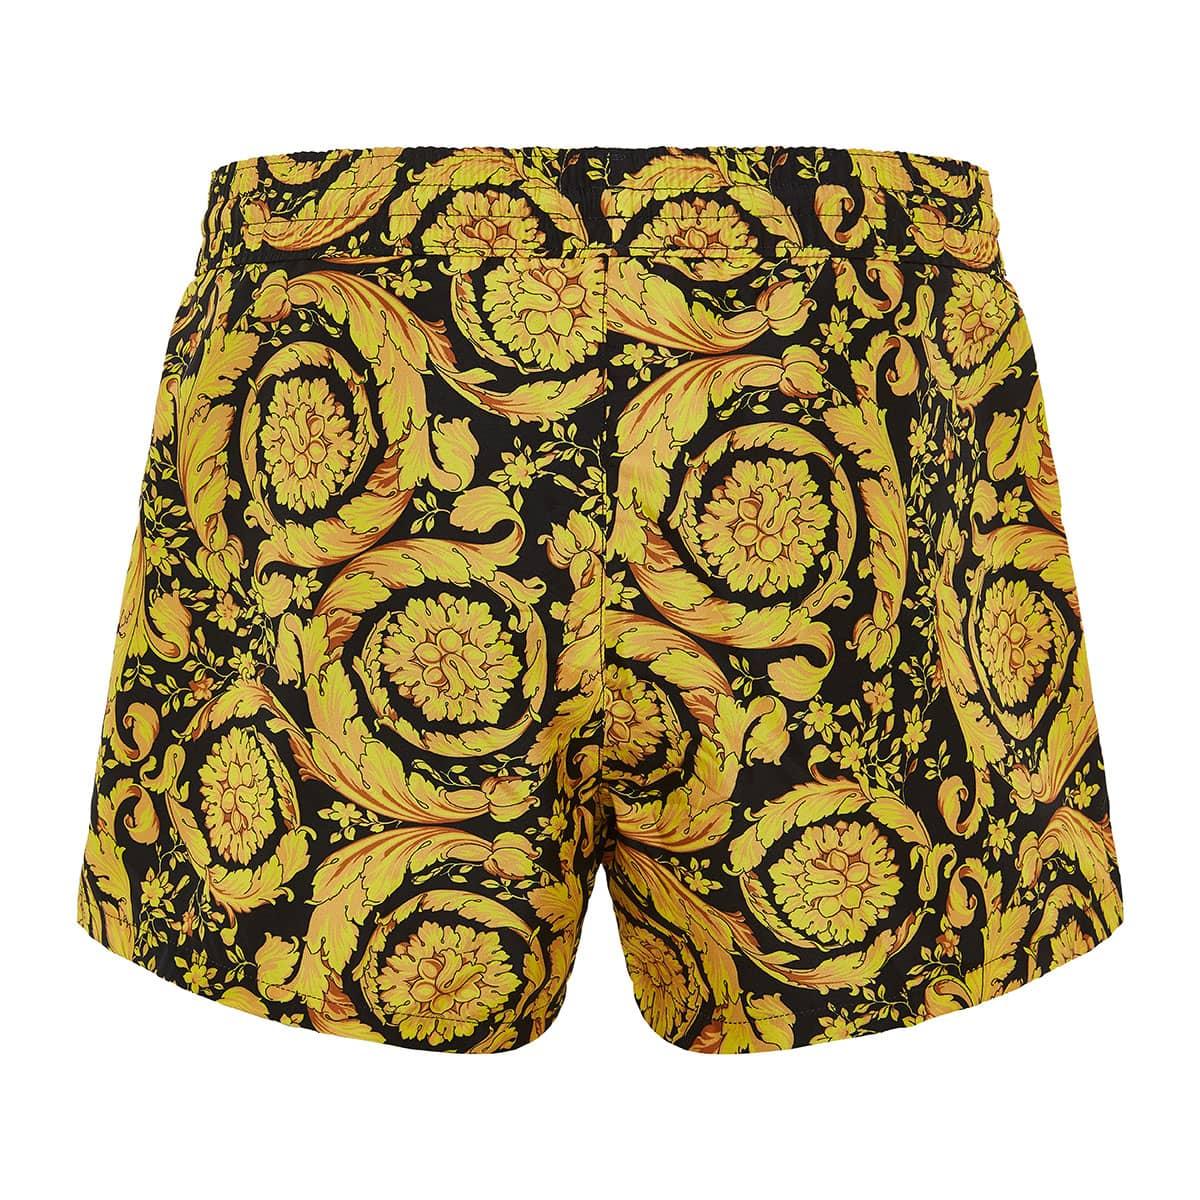 Baroque print short swim shorts